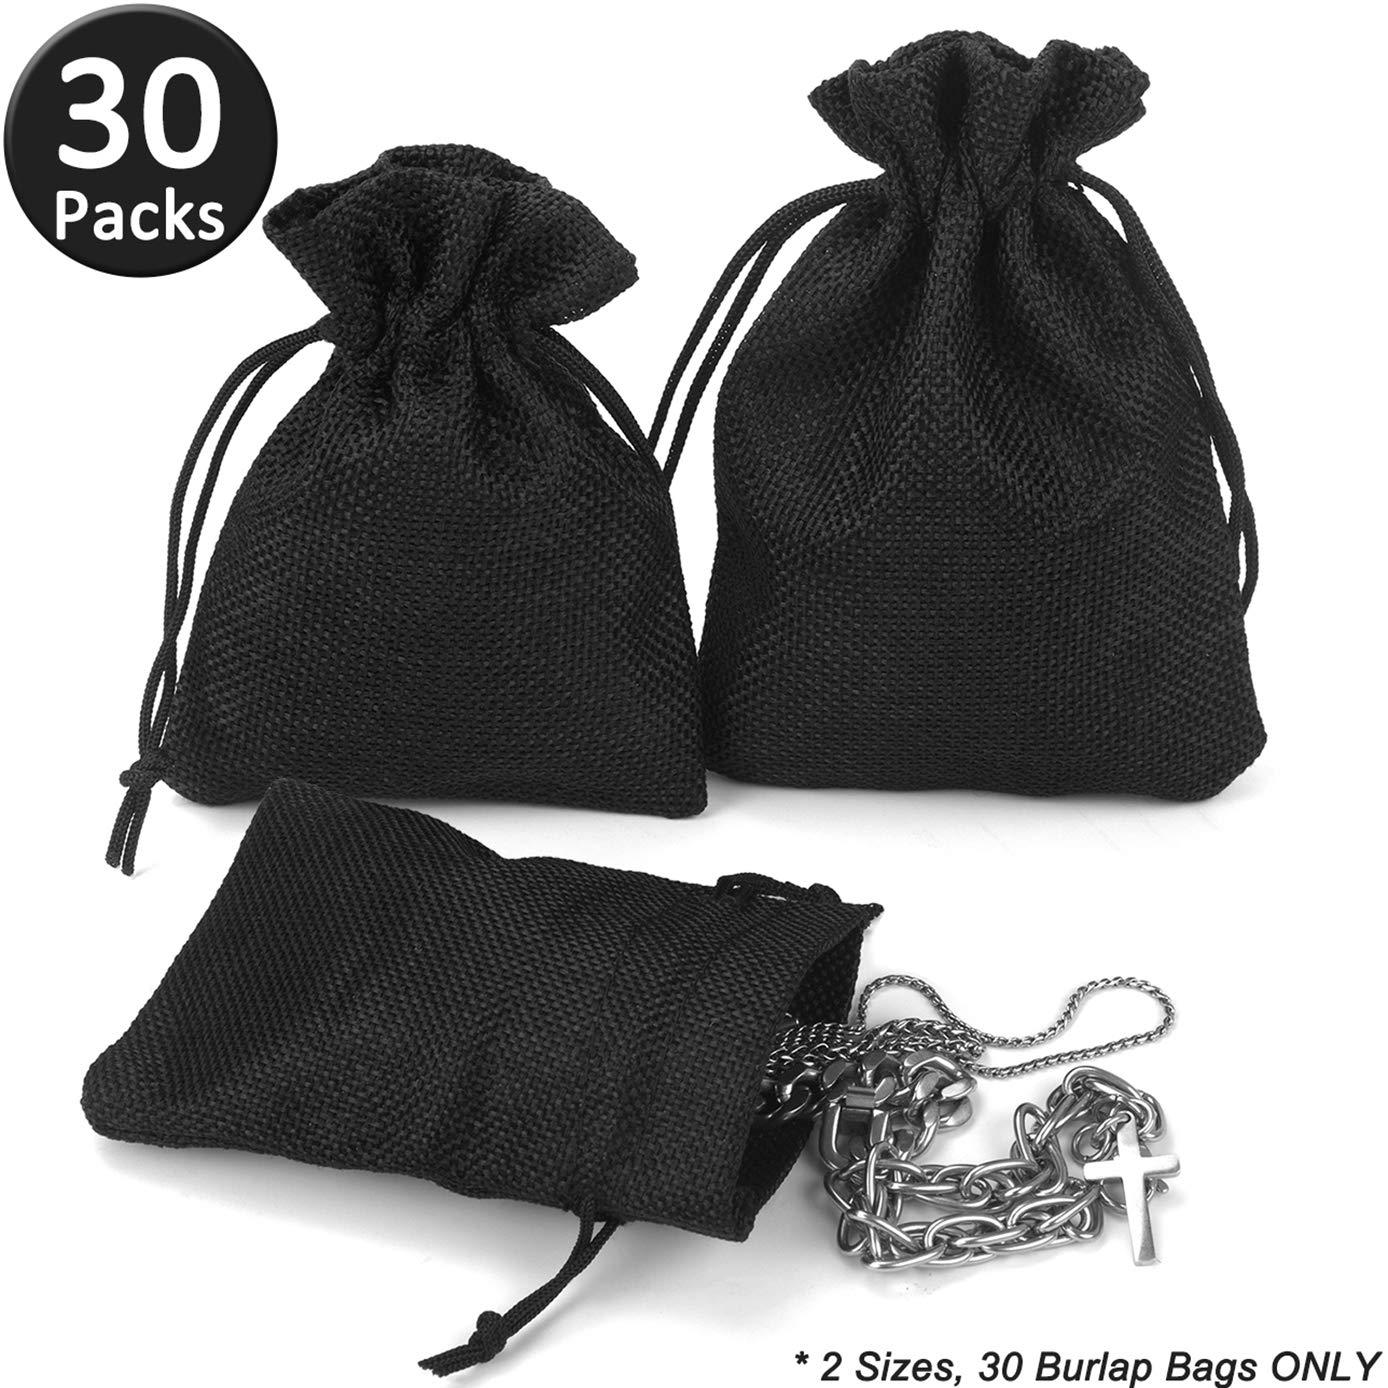 ADVcer Burlap Drawstring Bags Set, 4.8 x 3.5/5.5 x 4, Sacks 30 for Small Favor, Gift, Treat, Goodie, Party, Jewelry, Little Sachet, Coffee Bean, Mini Decor, Craft, Candy, Tea Storage, Gadget (Black)